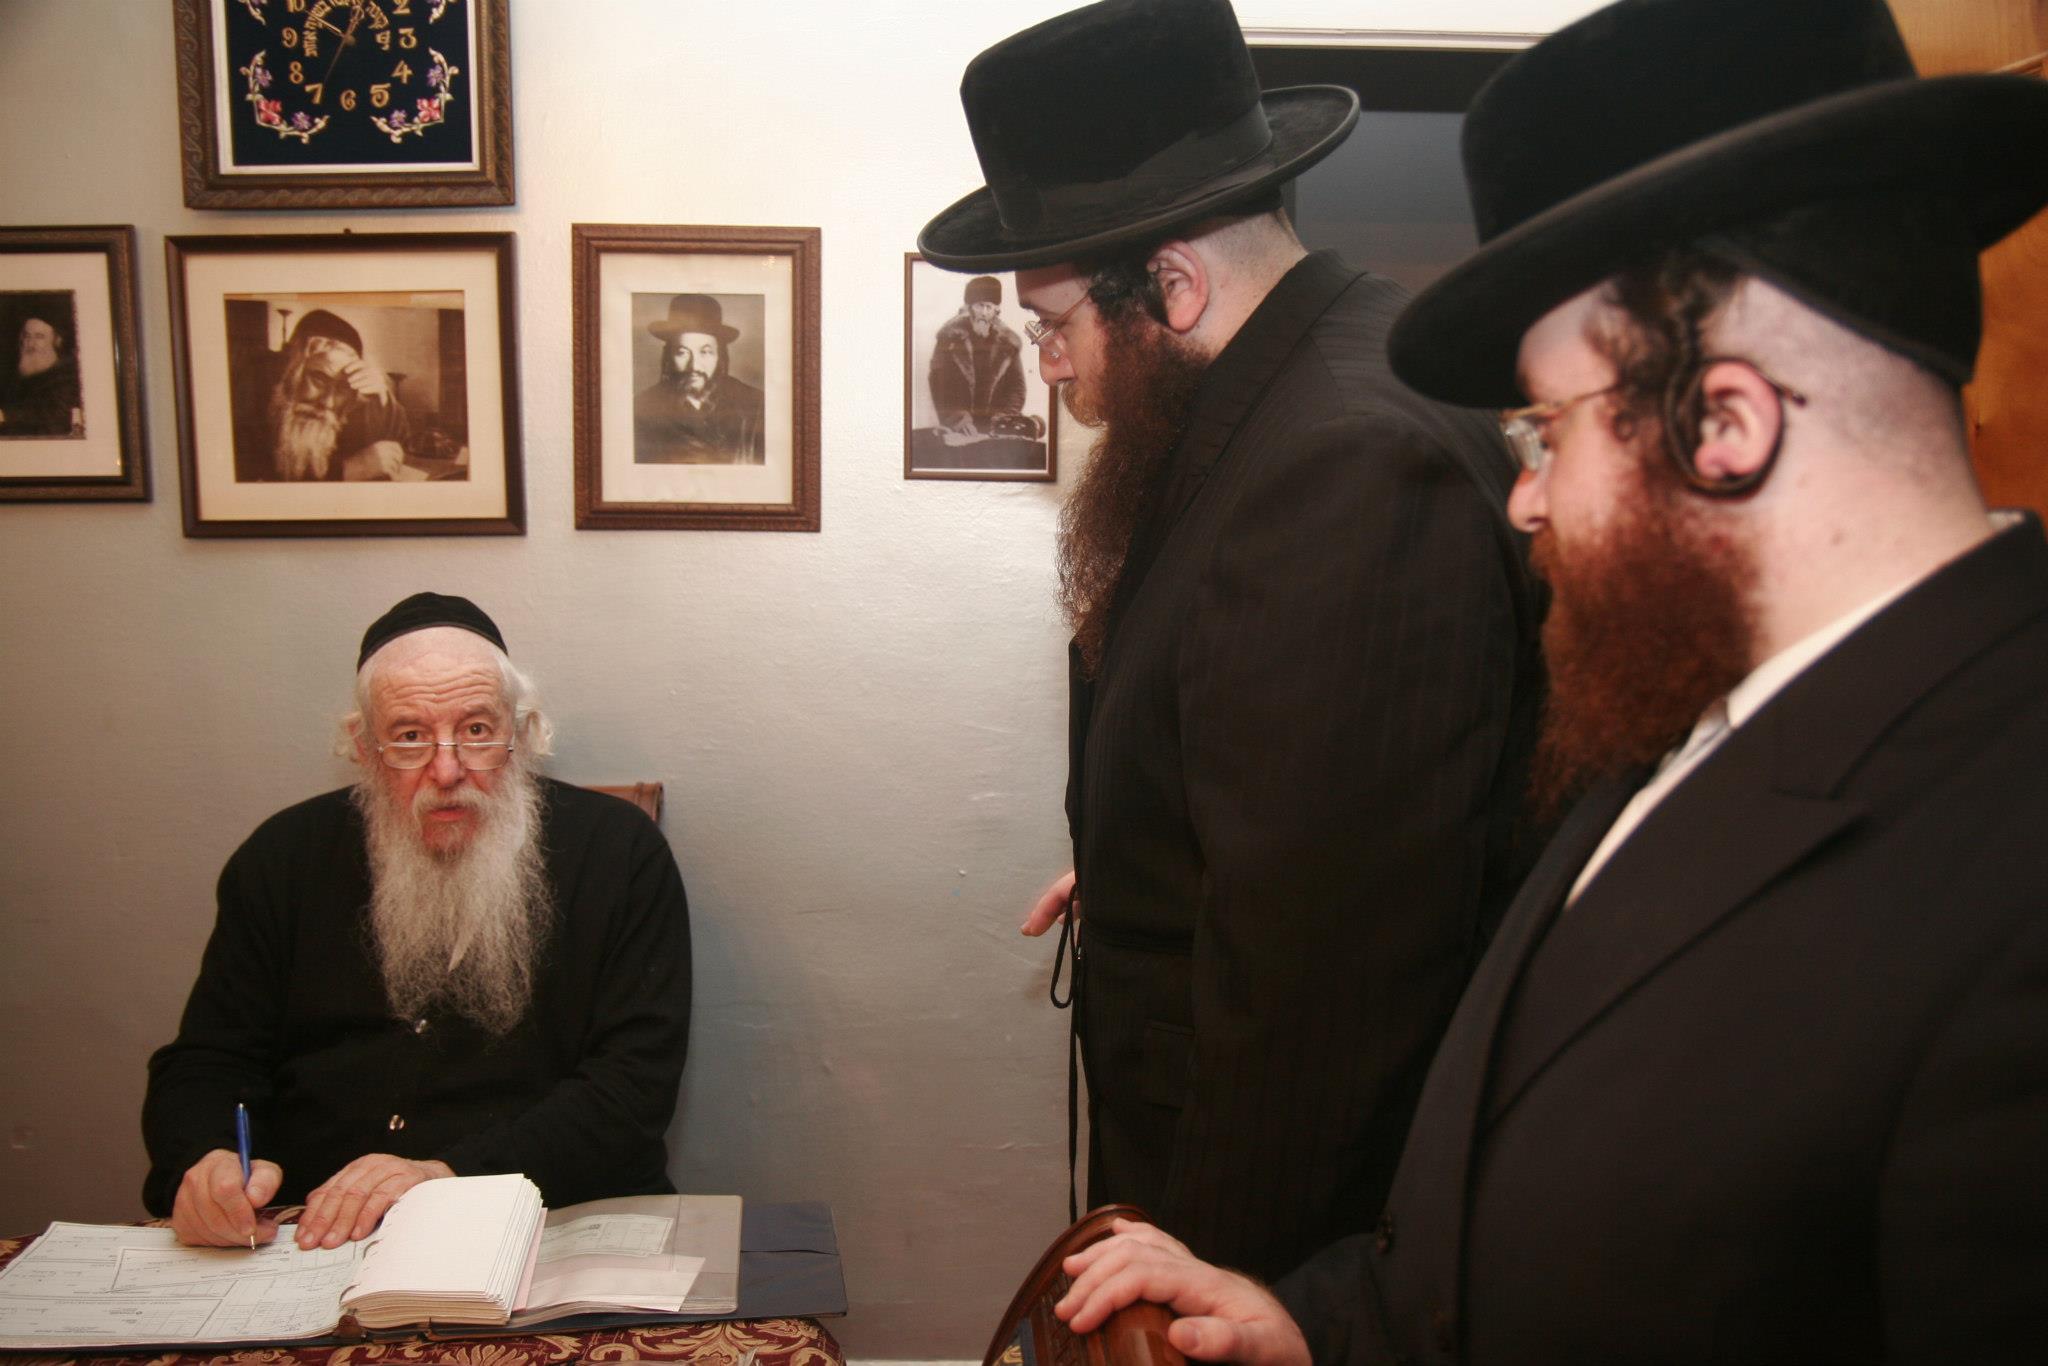 Masbia_Supporter__Novominsker_Rebbe__Rabbi_Yaakov_Perlow_Donating_to_Masbia_before_Yom_Kippur.jpg